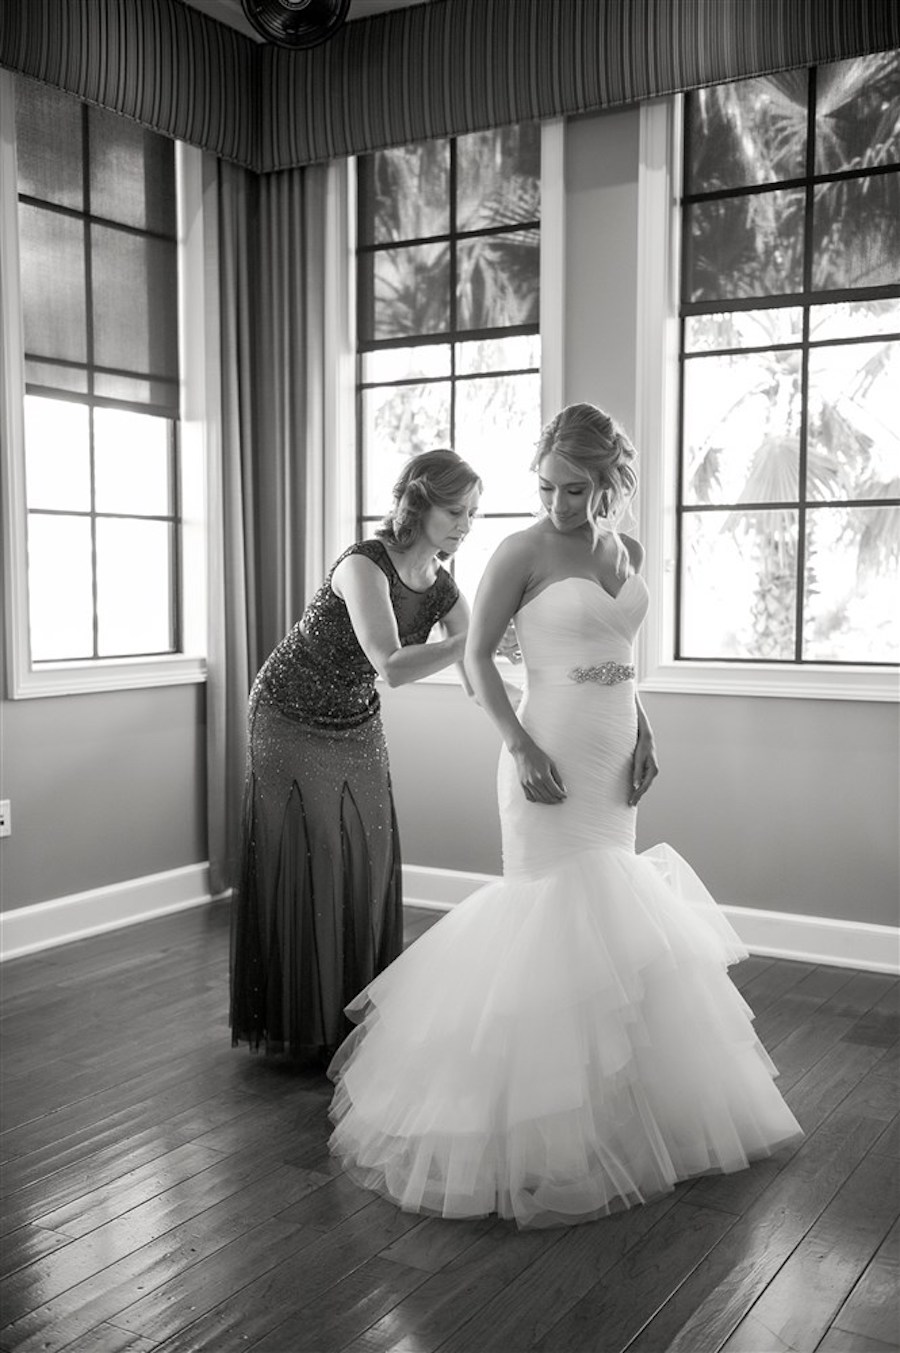 Bride Getting Dressed Portrait wearing Silver Jewel Belted Sweetheart Mermaid Wedding Dress